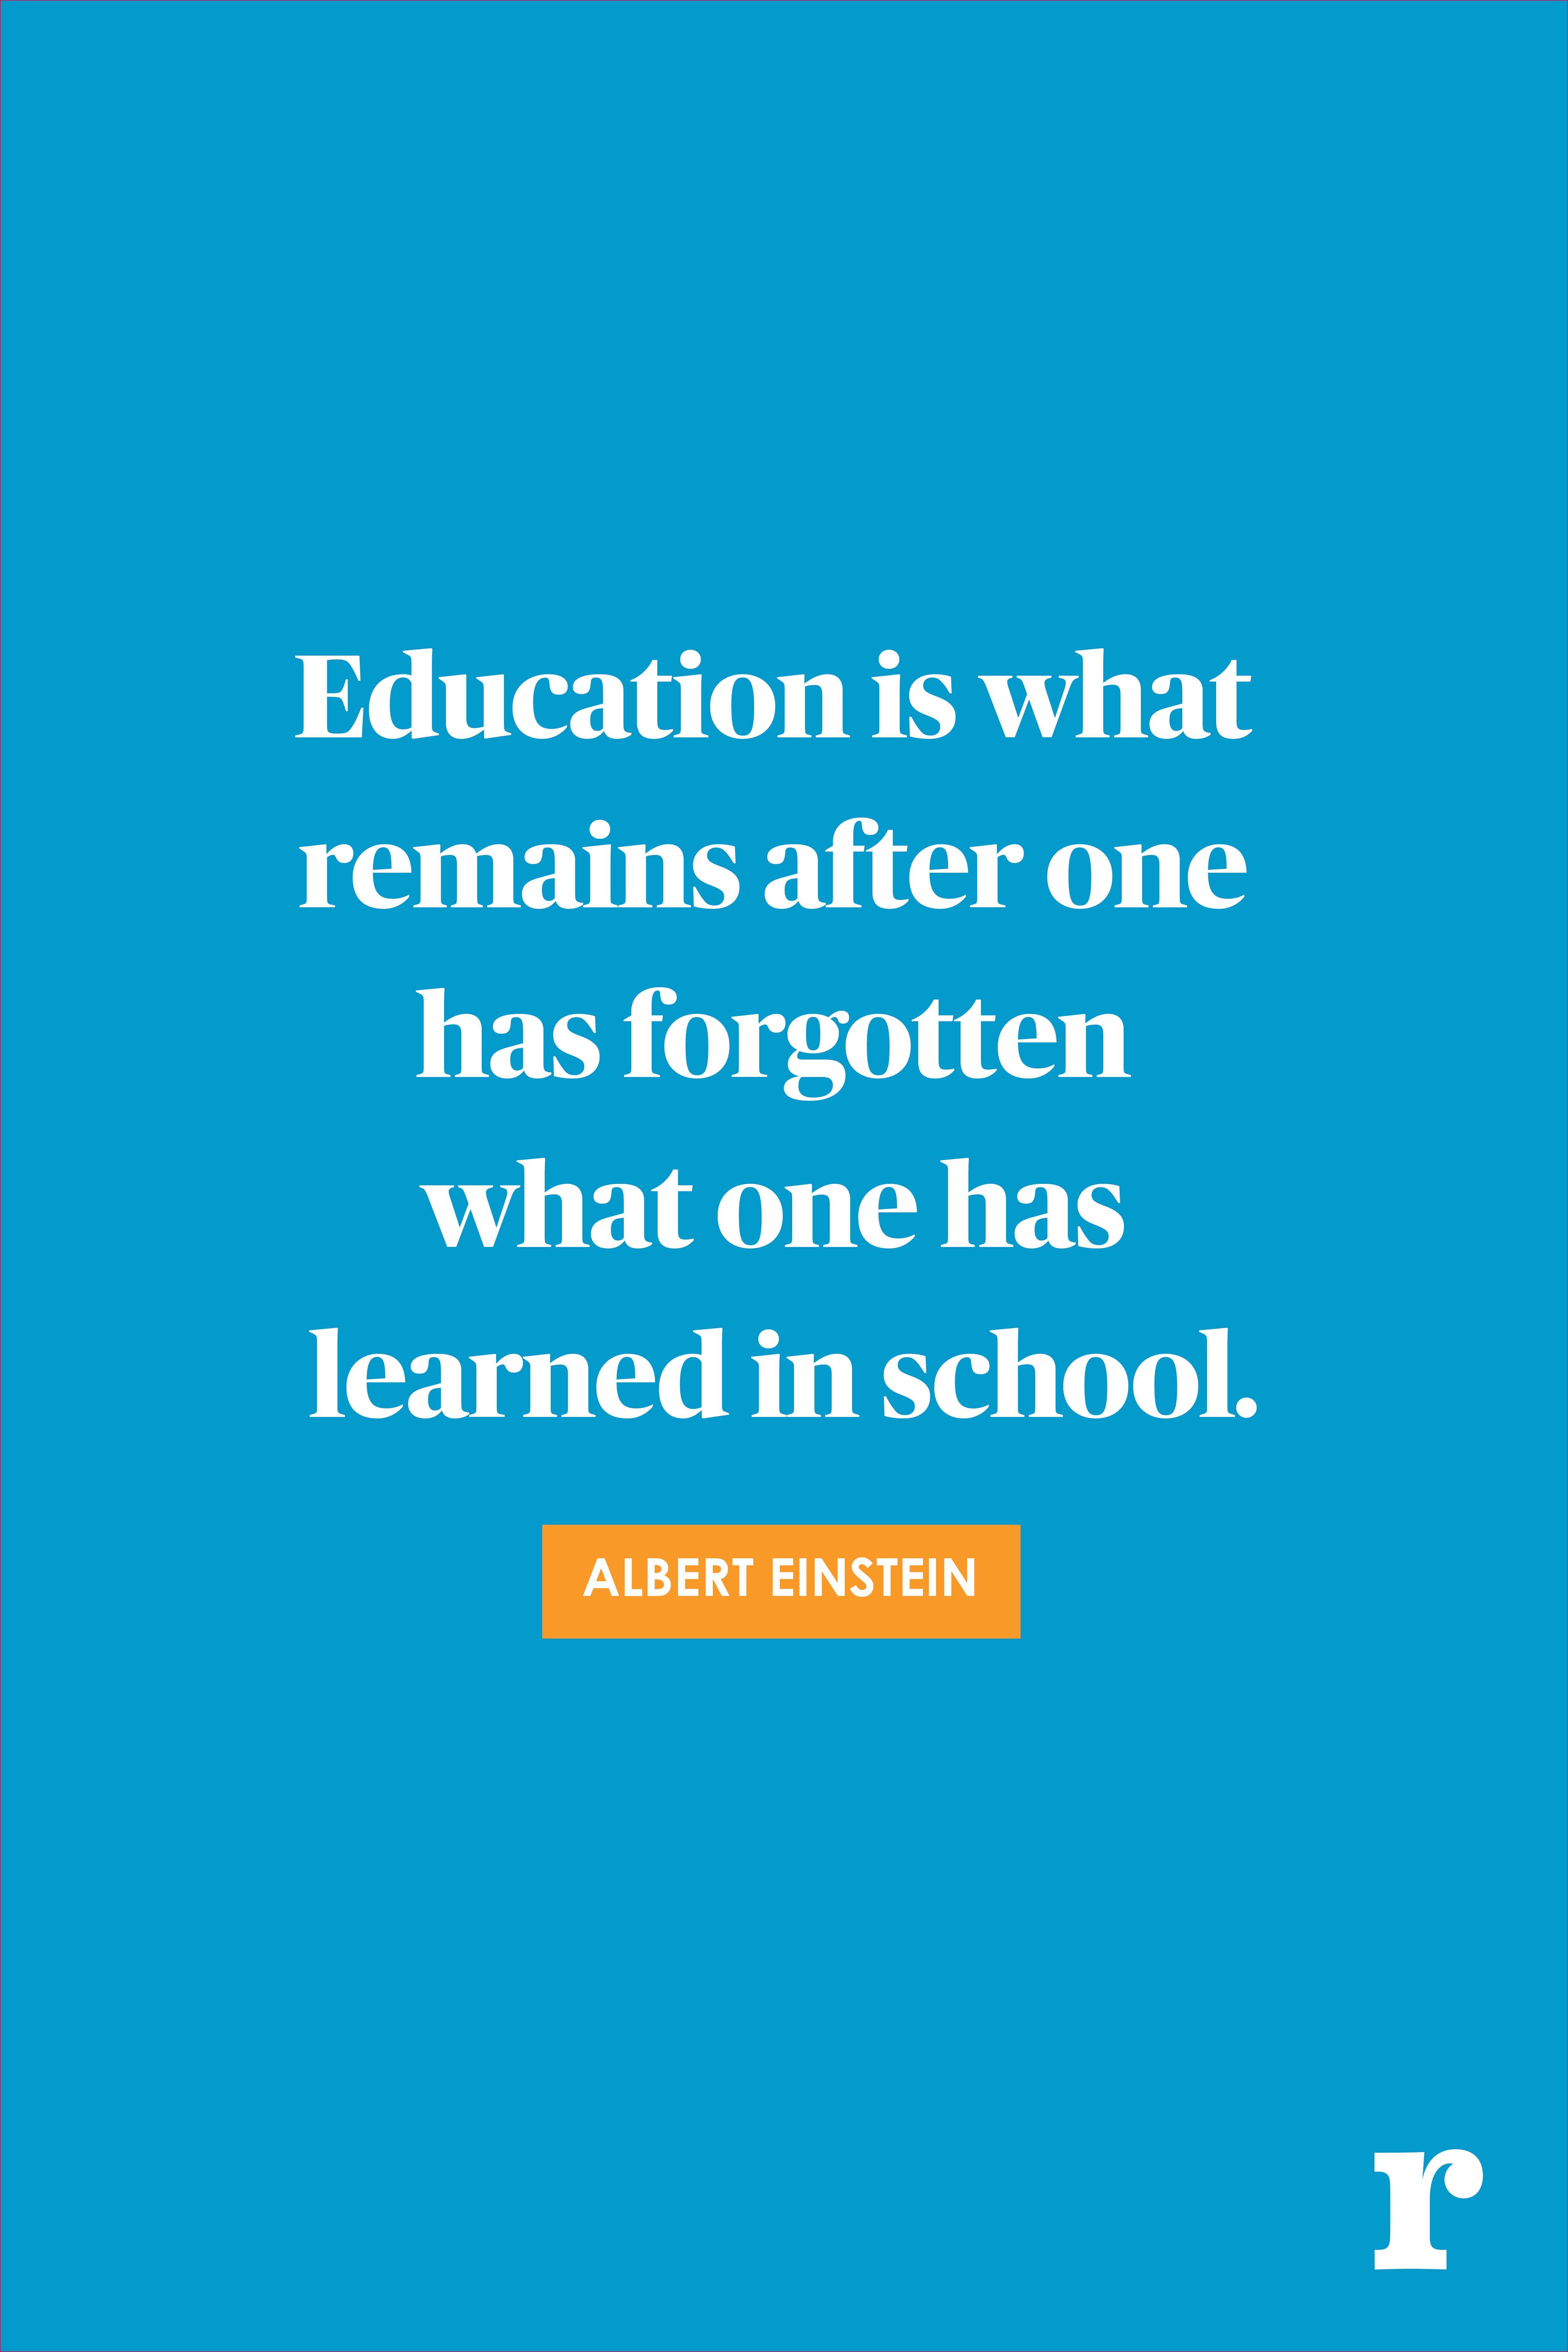 16 Best School Quotes Inspirational School Quotes